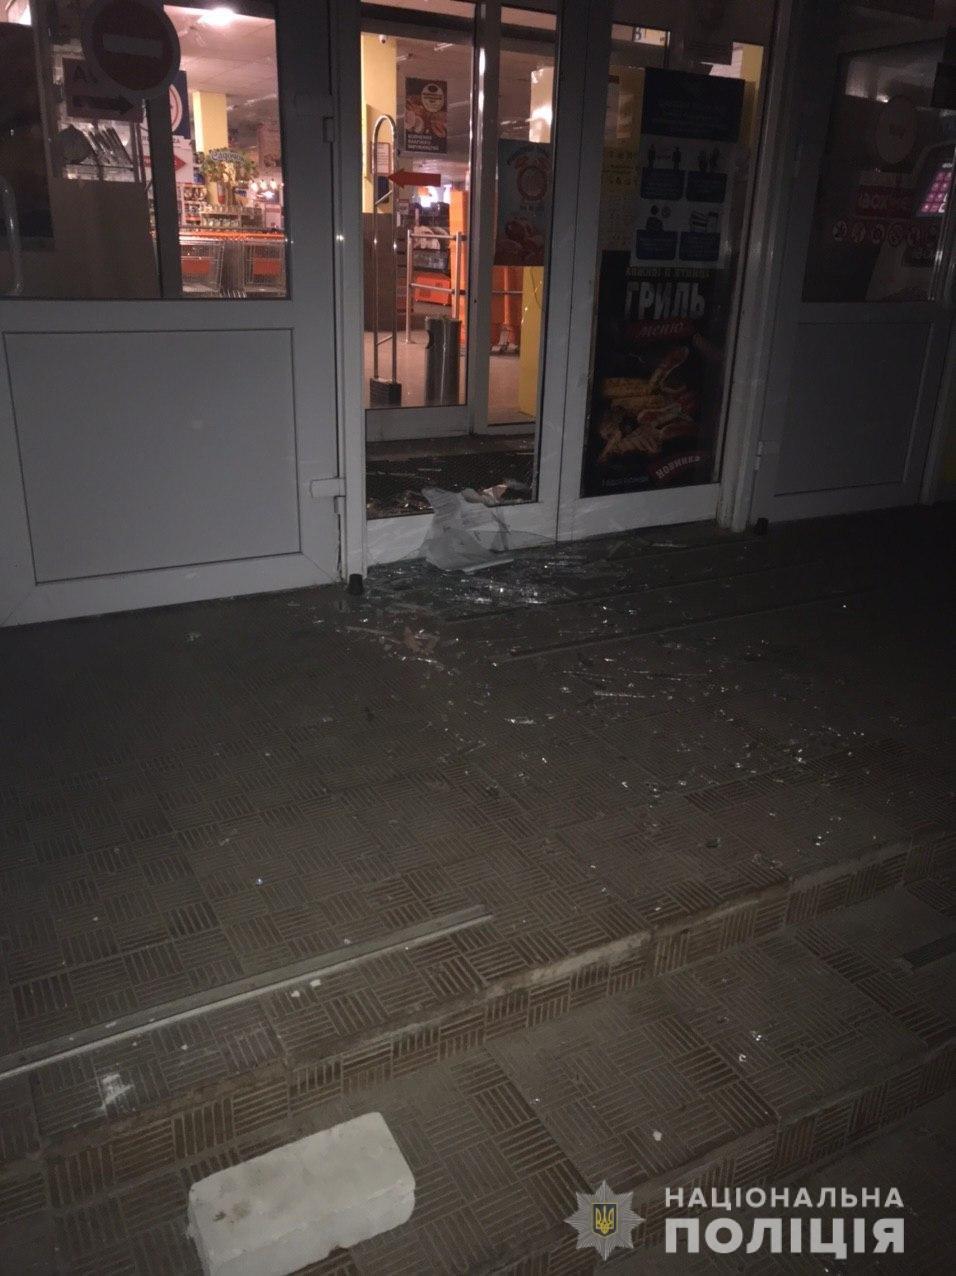 В Харькове неизвестные взорвали банкомат, находящийся в супермаркете, - ФОТО, фото-2